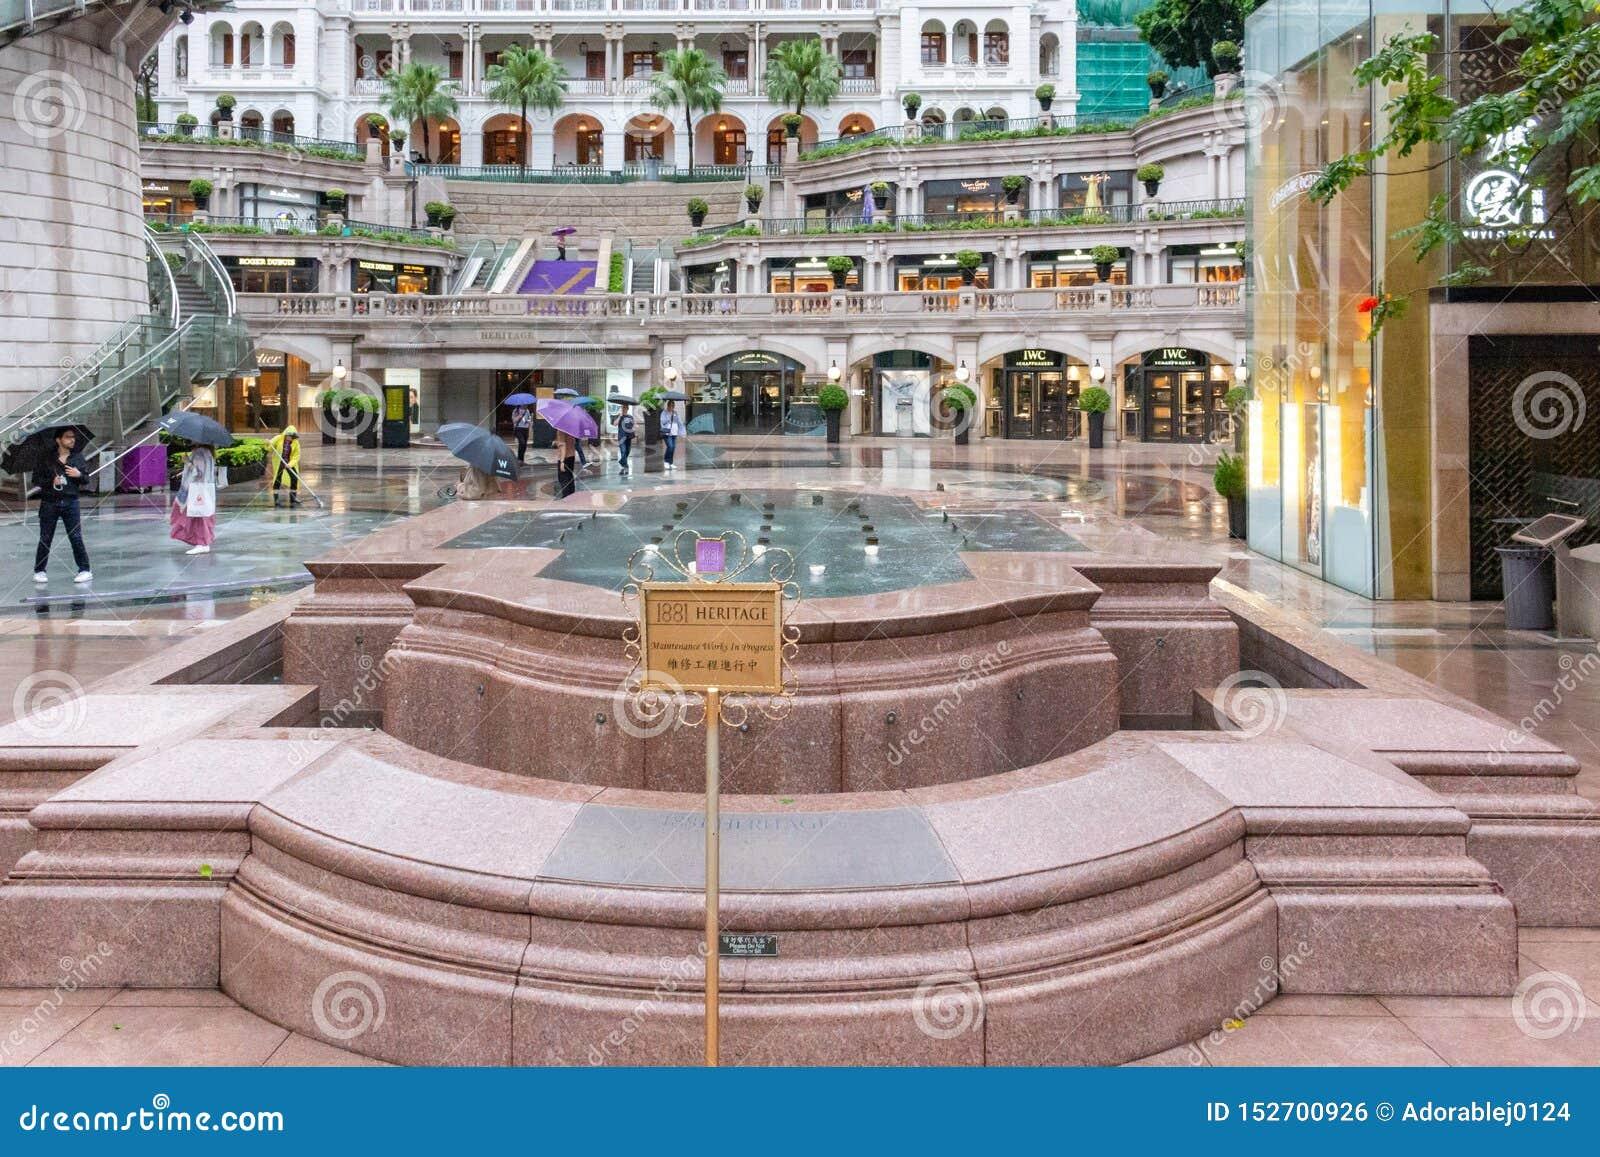 1881 dziedzictwa centrum handlowe przy Tsim Sha Tsui, Kowloon, Hong Kong